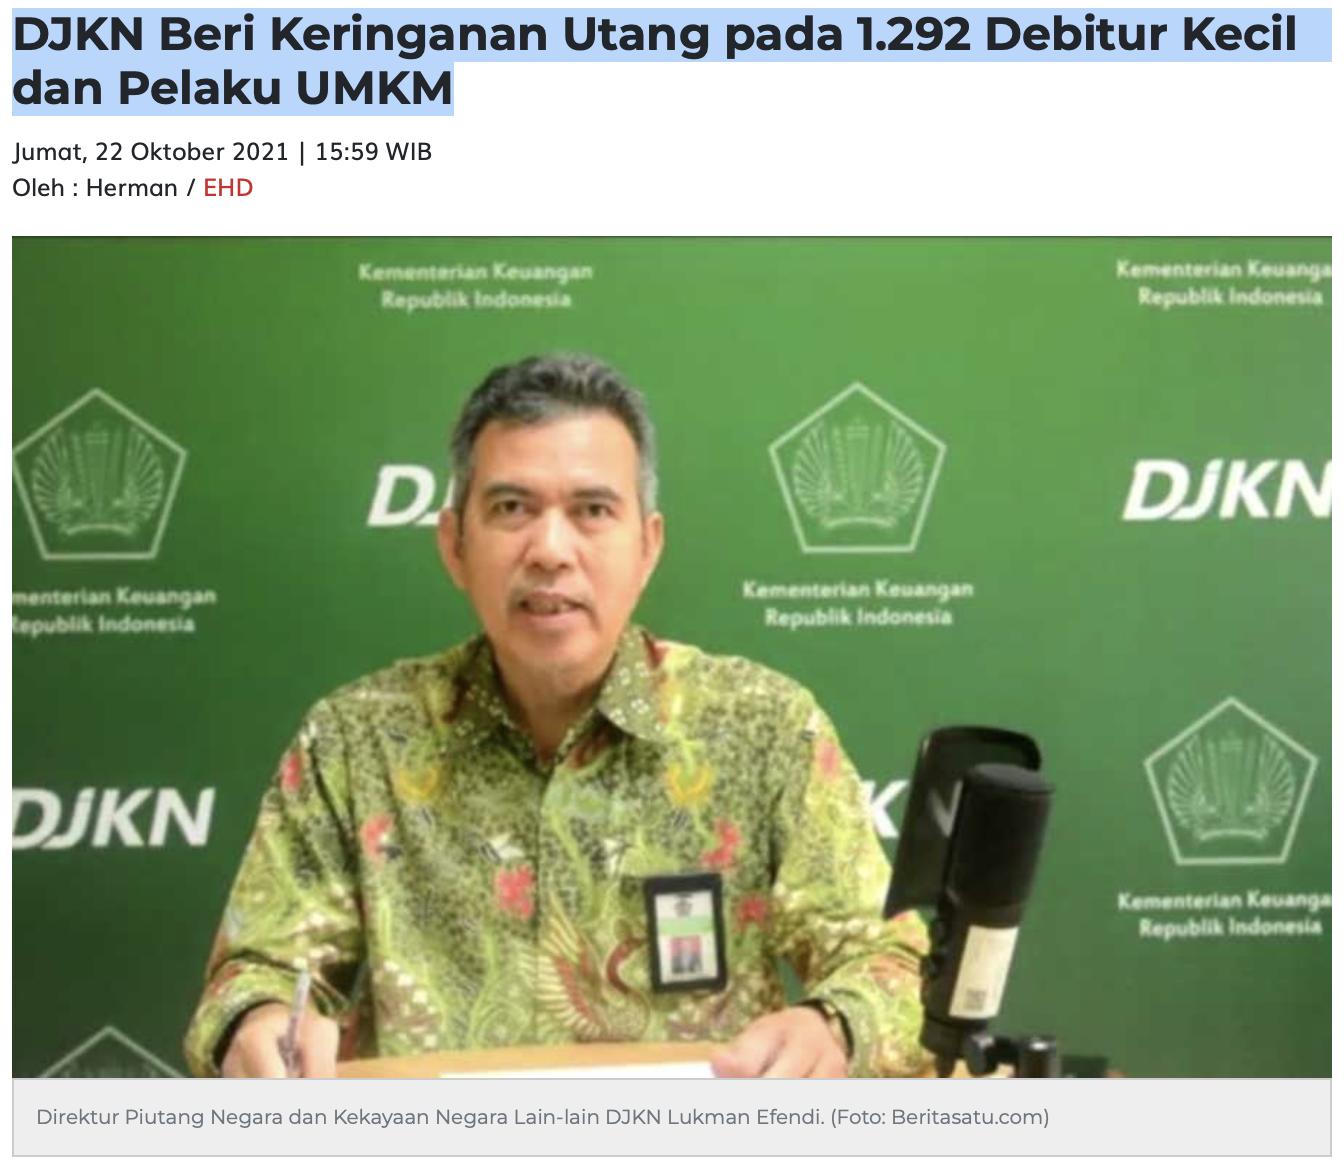 DJKN Beri Keringanan Utang pada 1.292 Debitur Kecil dan Pelaku UMKM